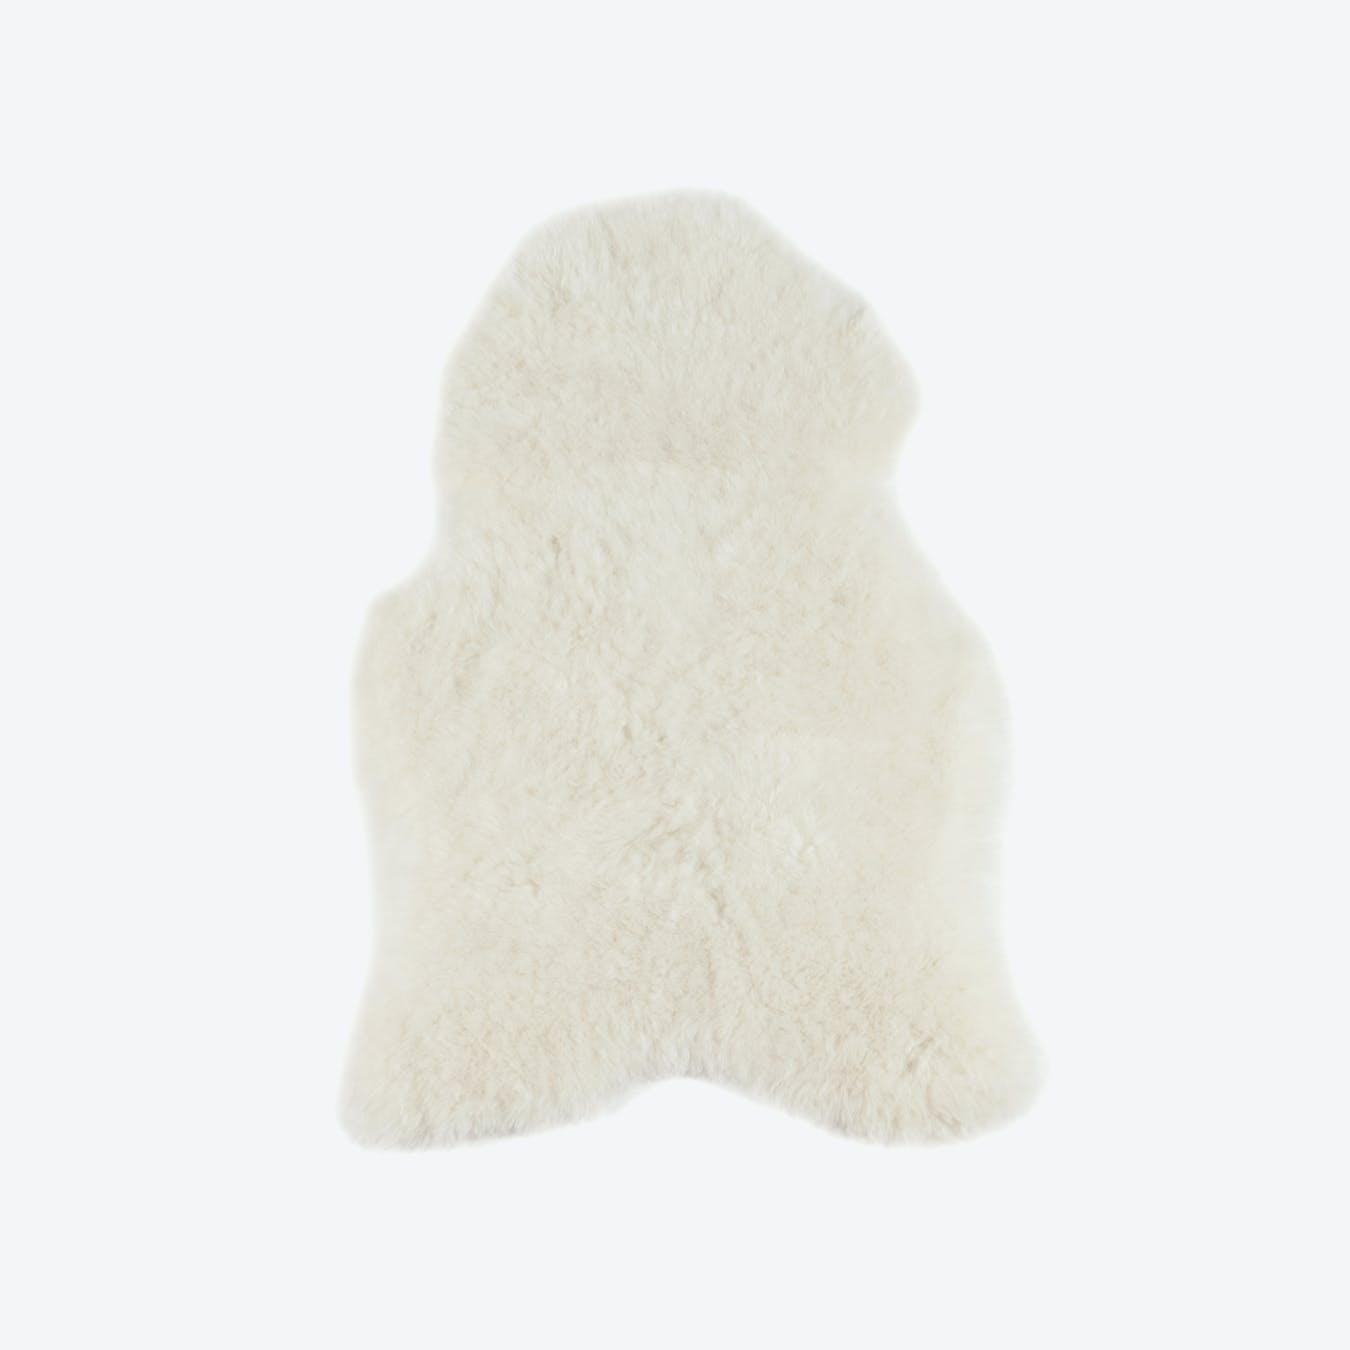 White Icelandic Short Sheepskin Rug